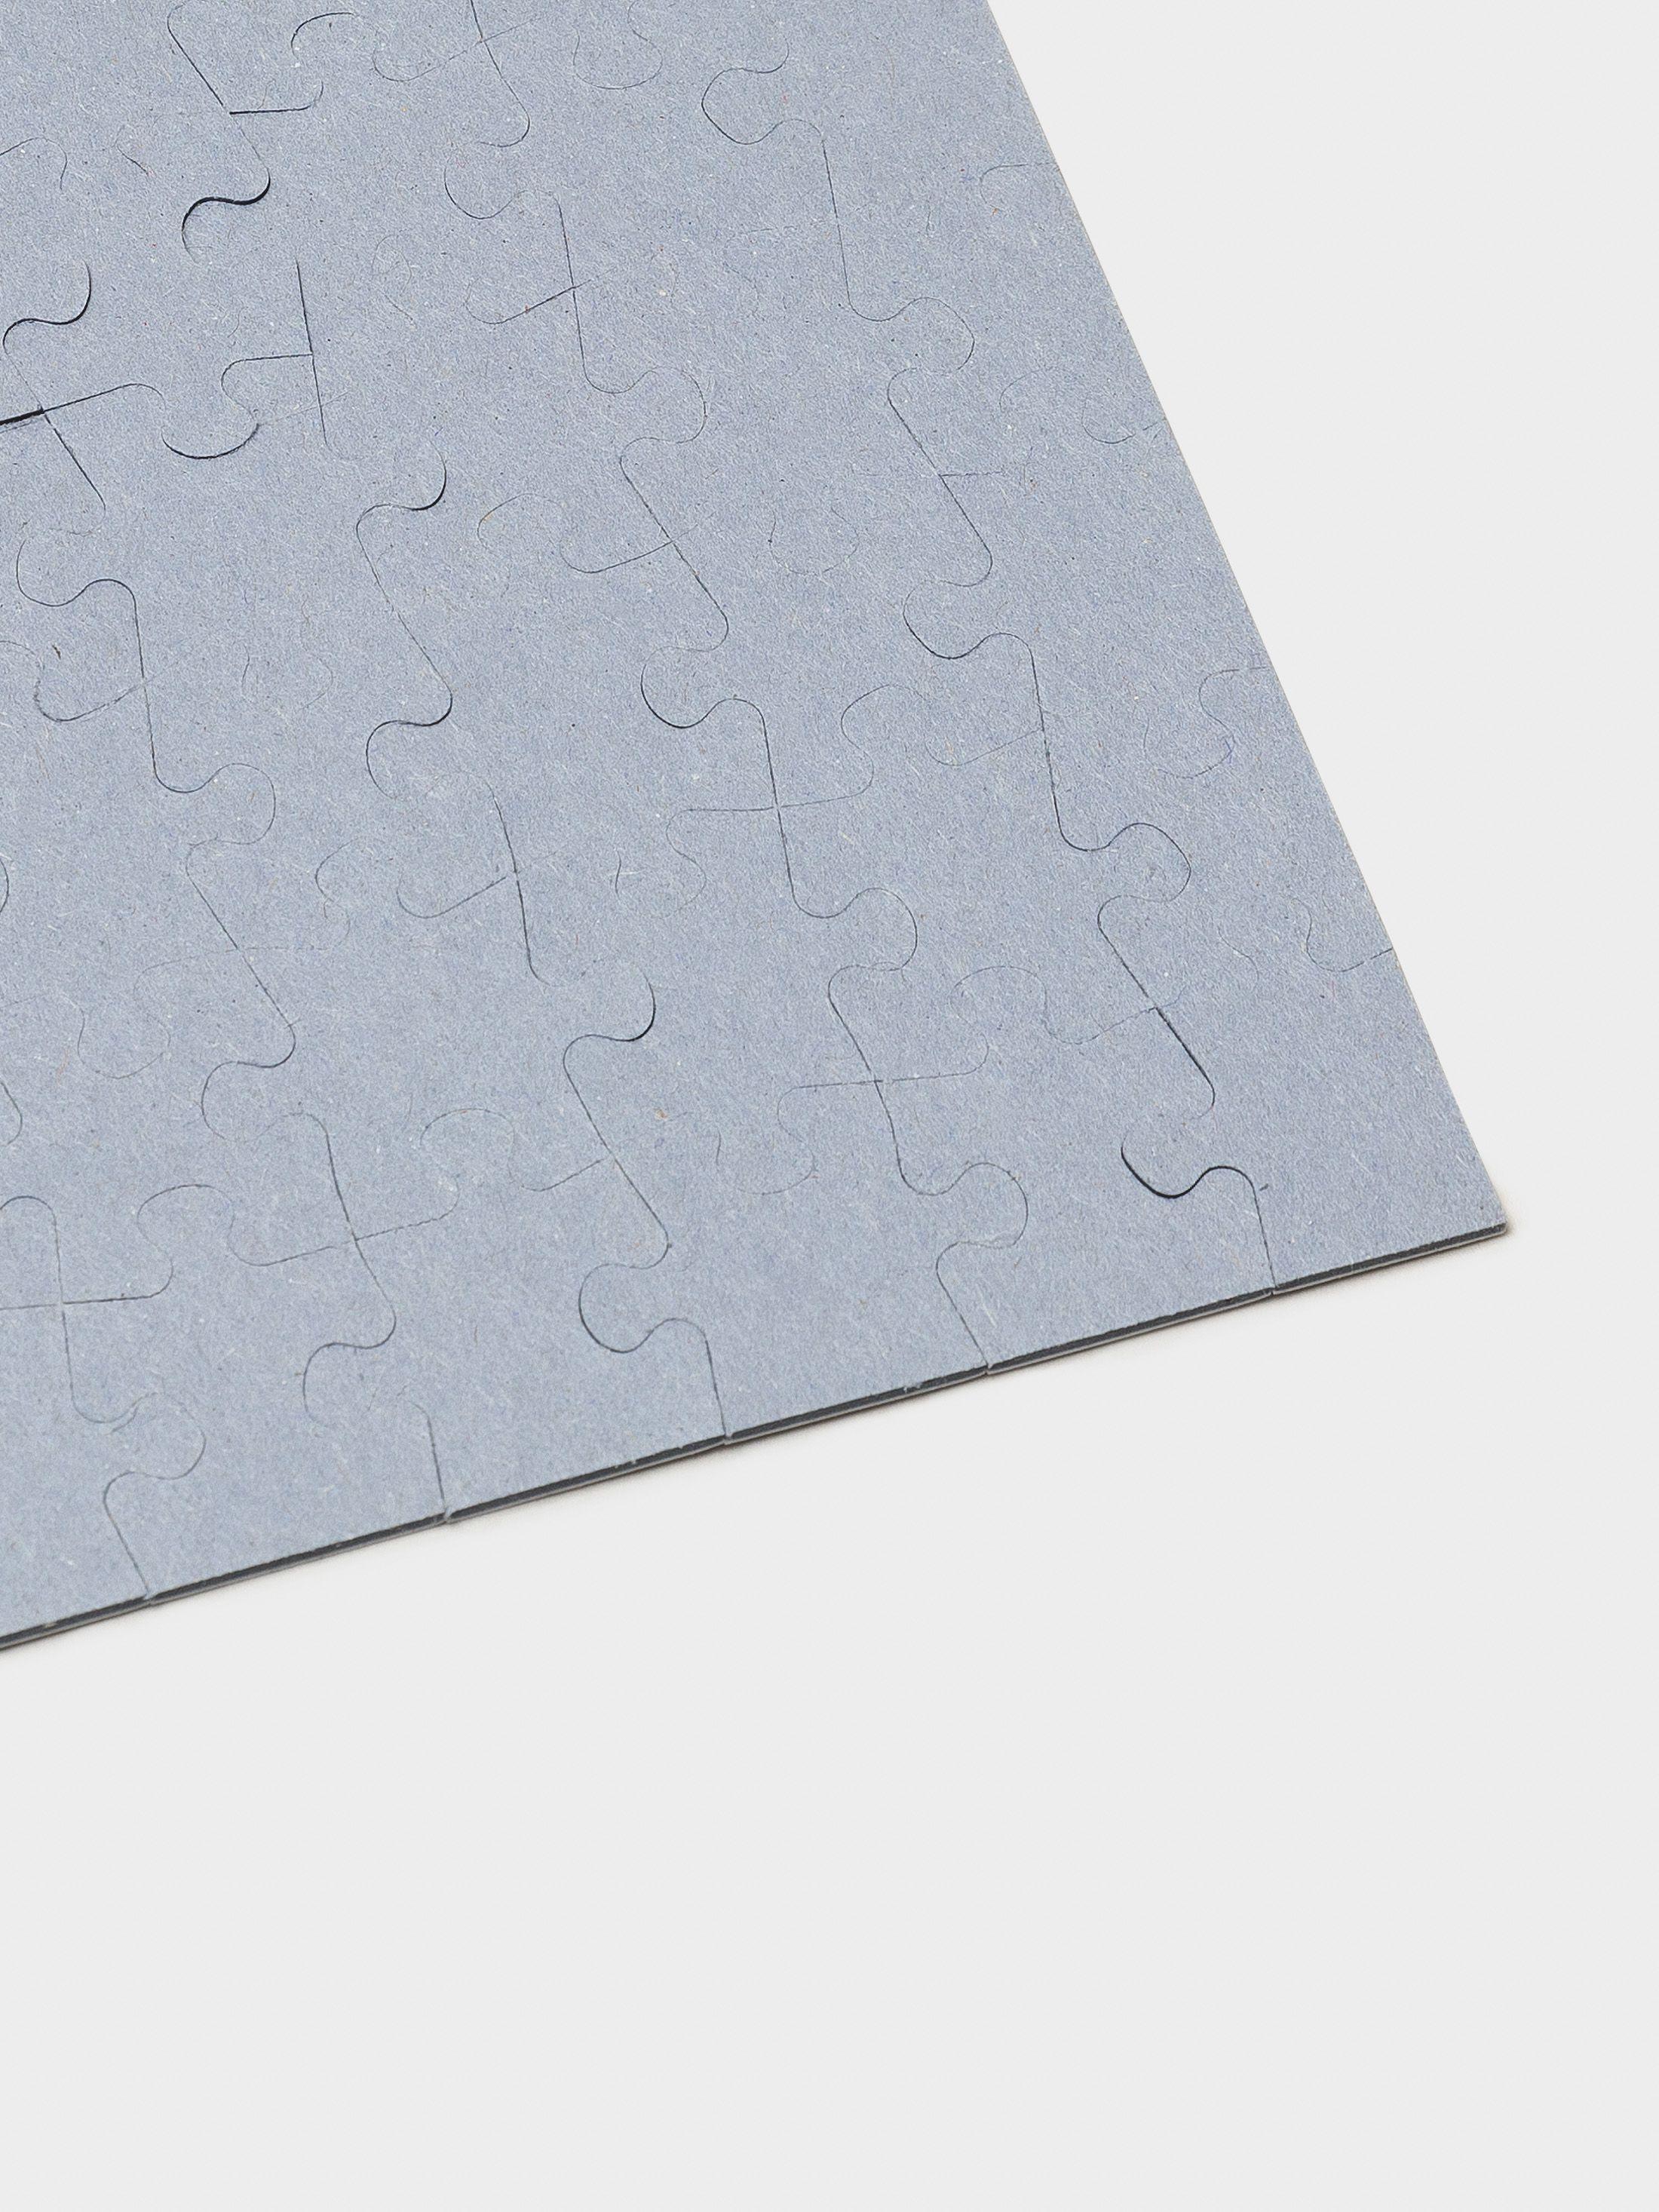 500 piece jigsaw puzzle pieces